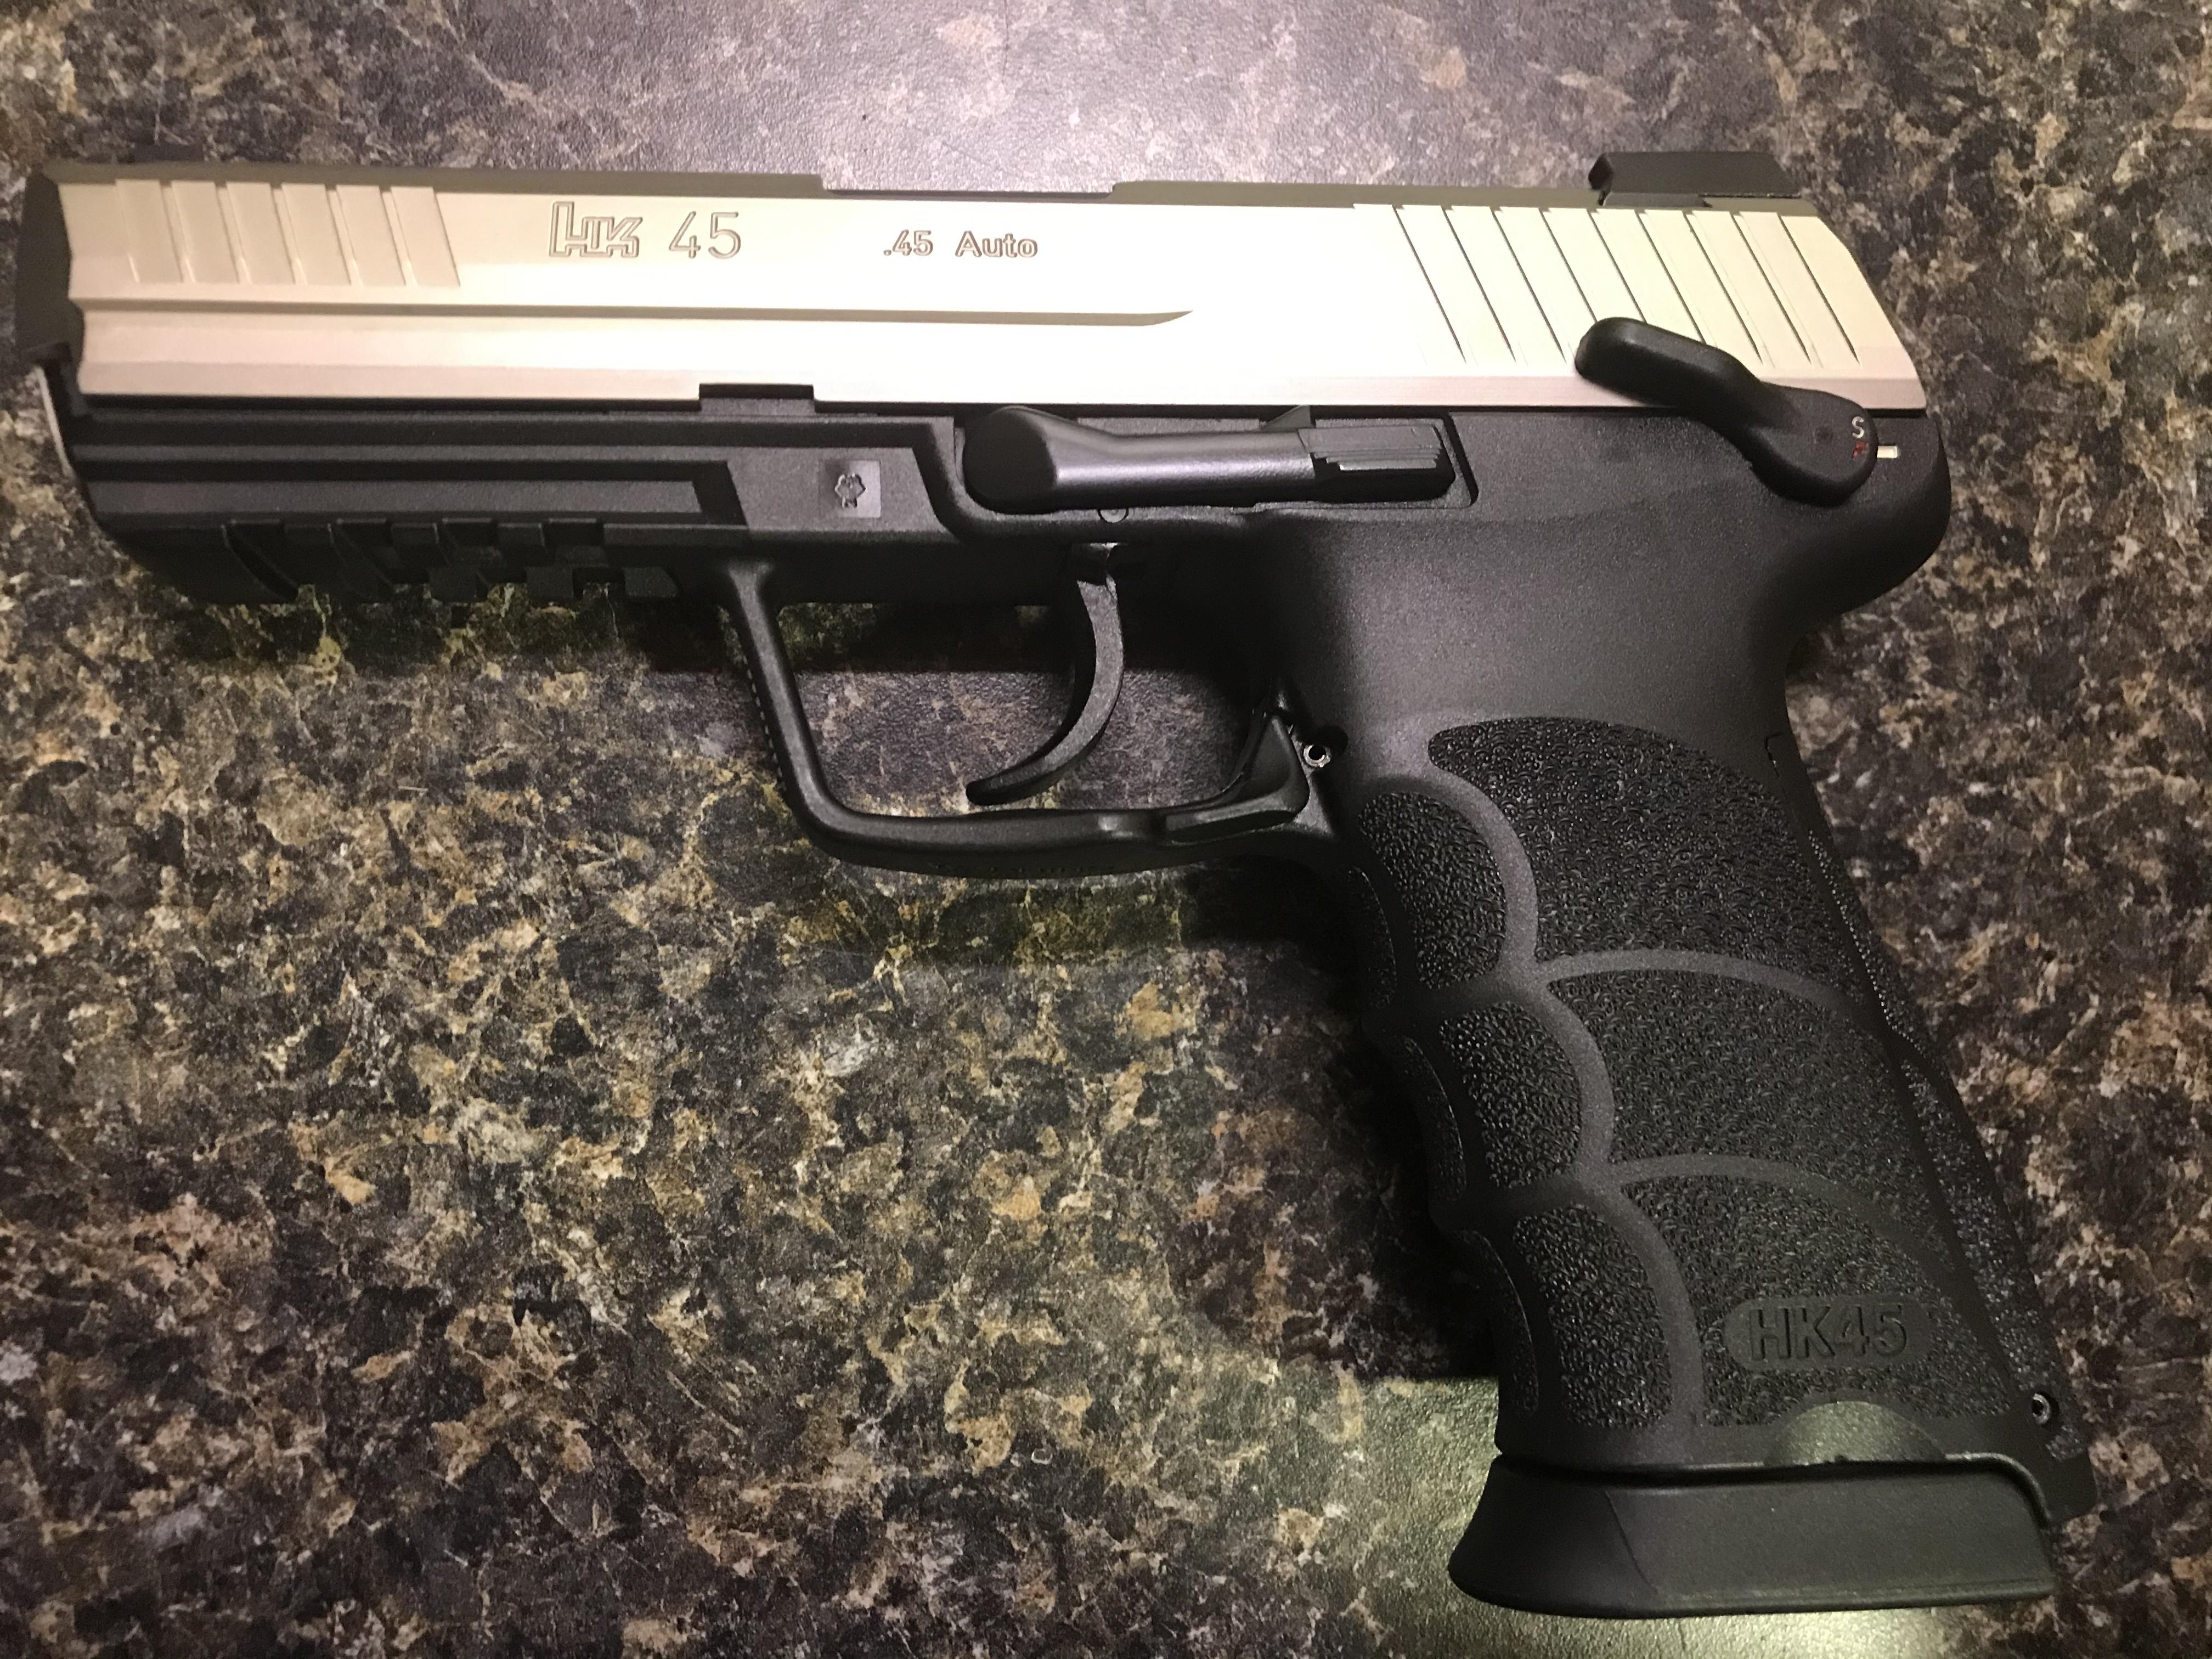 WTS:  HK45, German-made, custom finish, LEM with manual safety and night sights-434a4f02-4122-404b-8265-c0f3502a3f68.jpeg